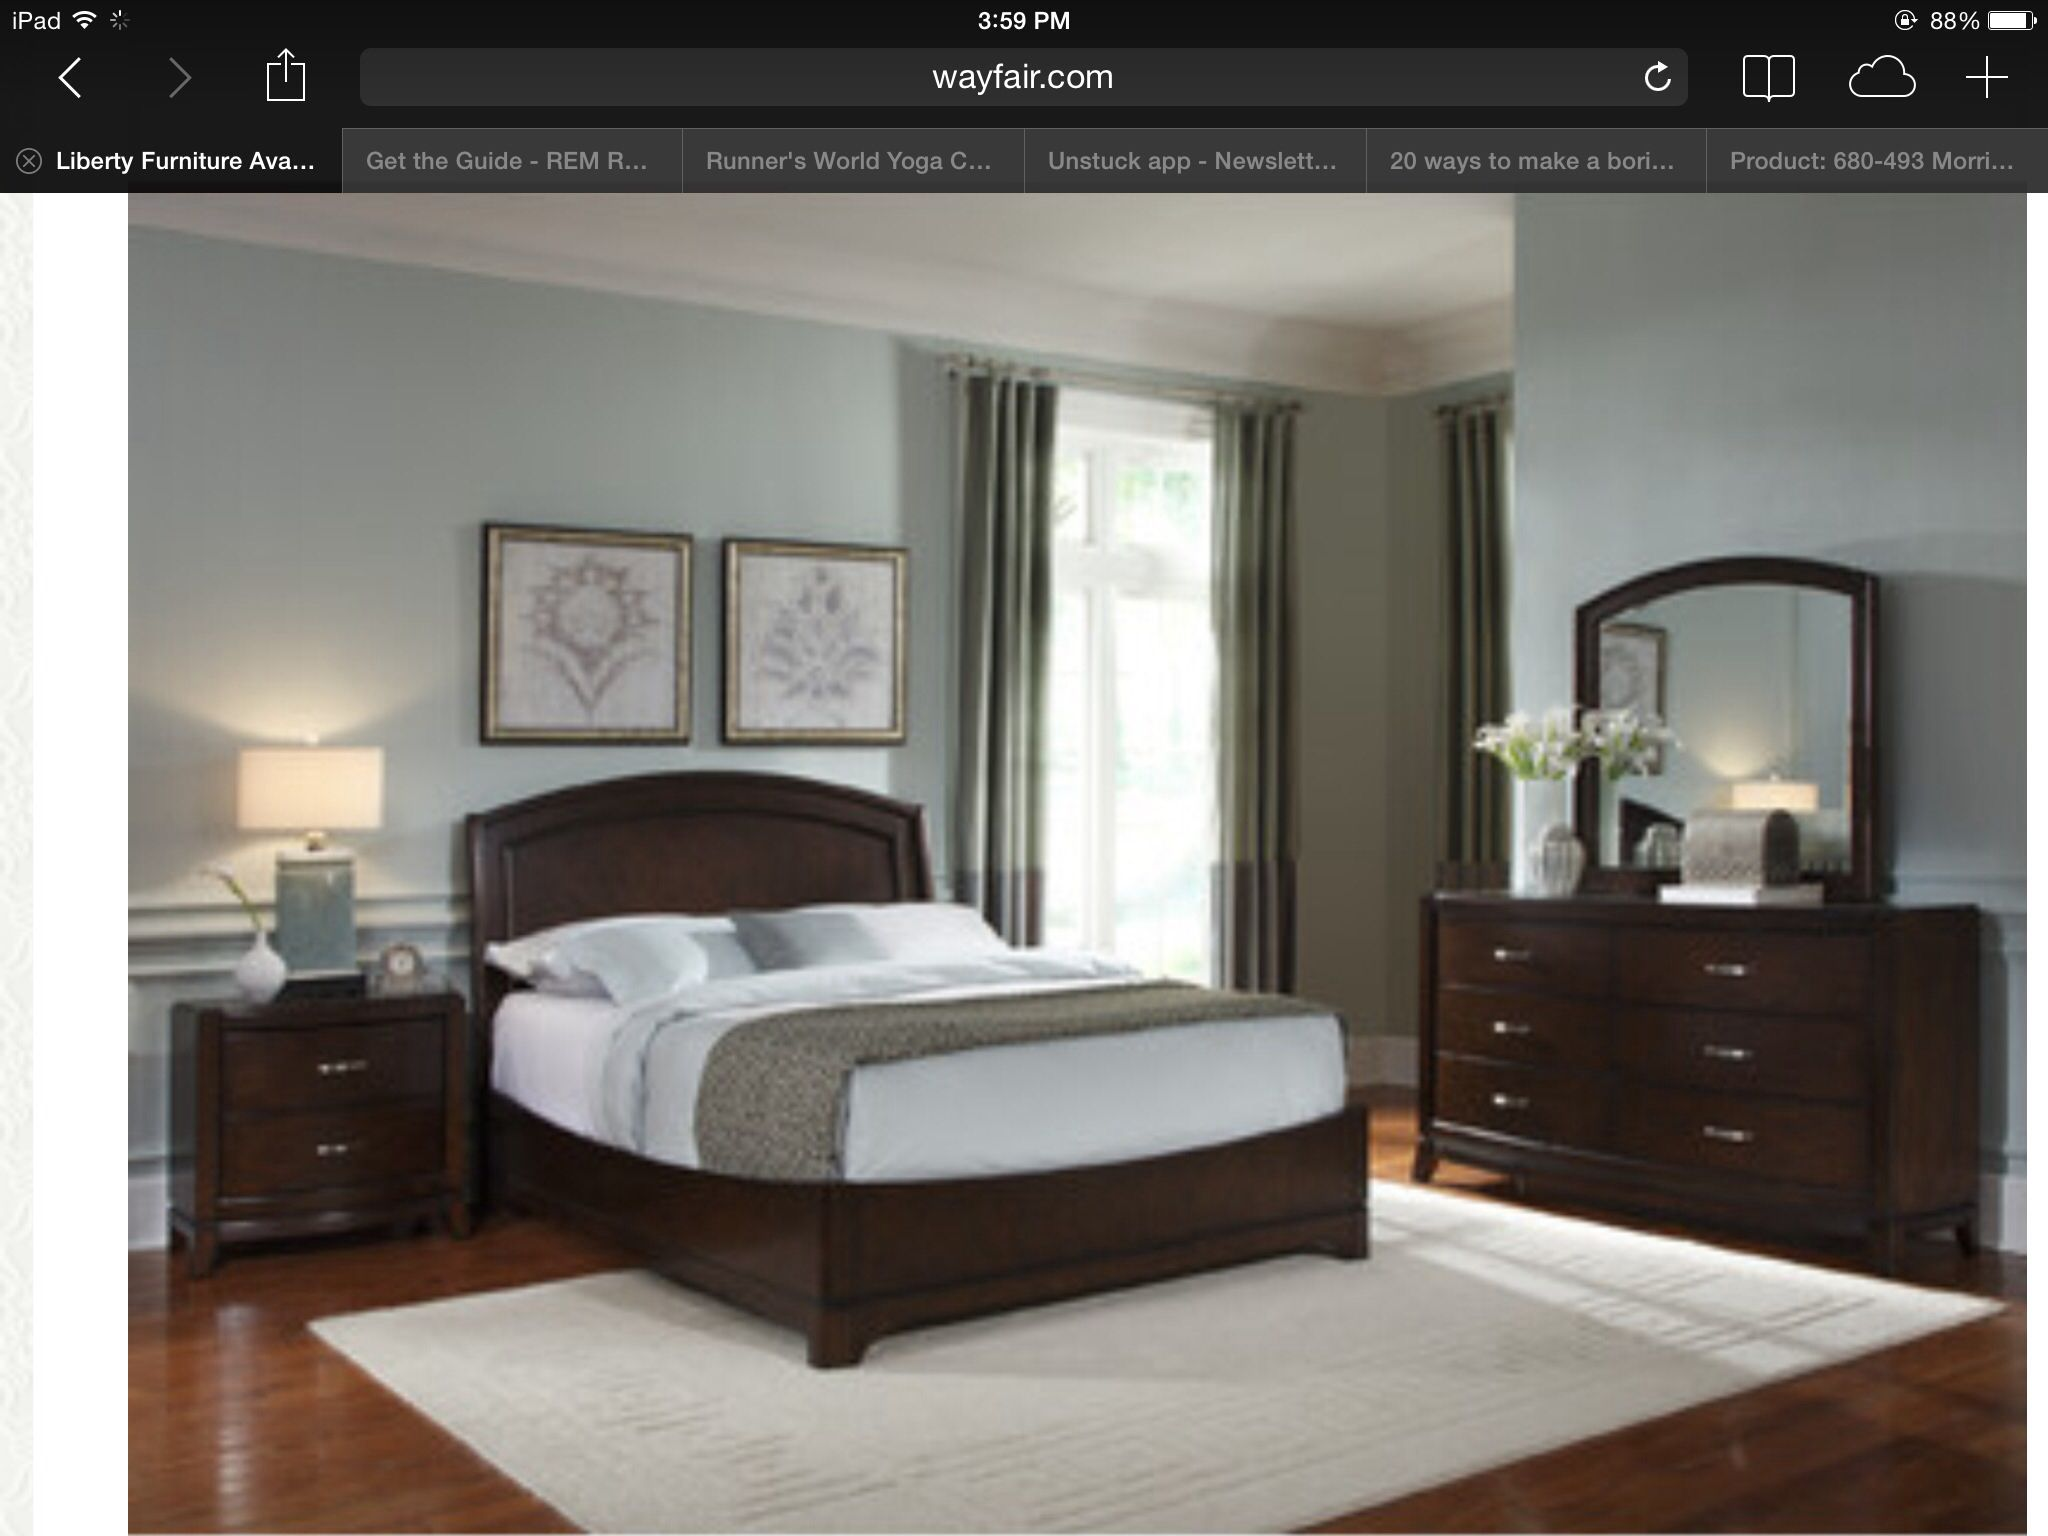 Avalon Bedroom Furniture On Wayfair